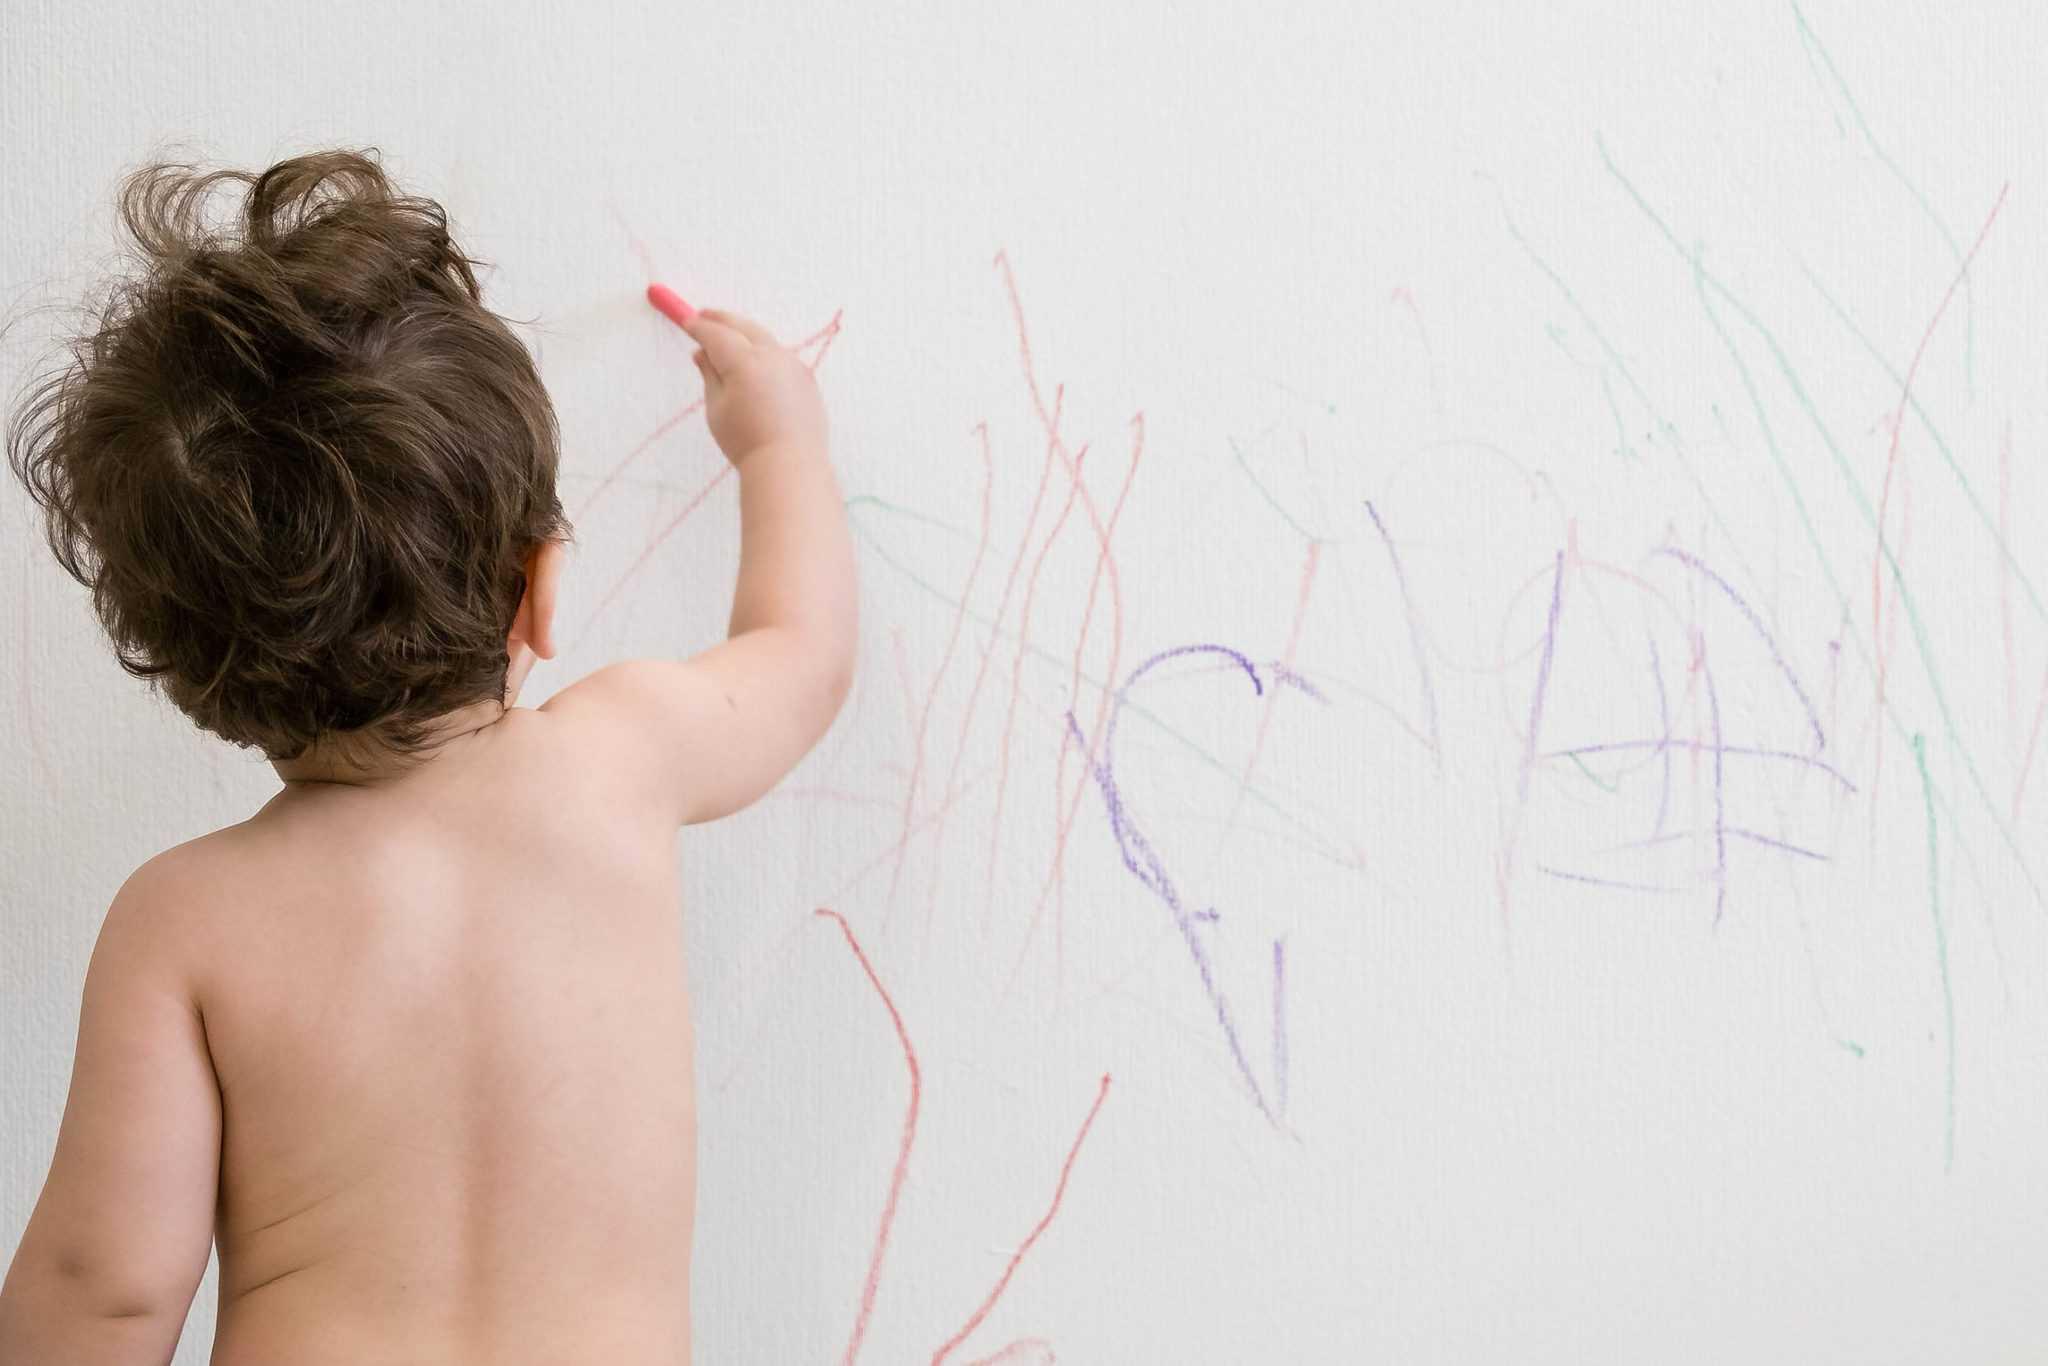 kids scribbling on wall